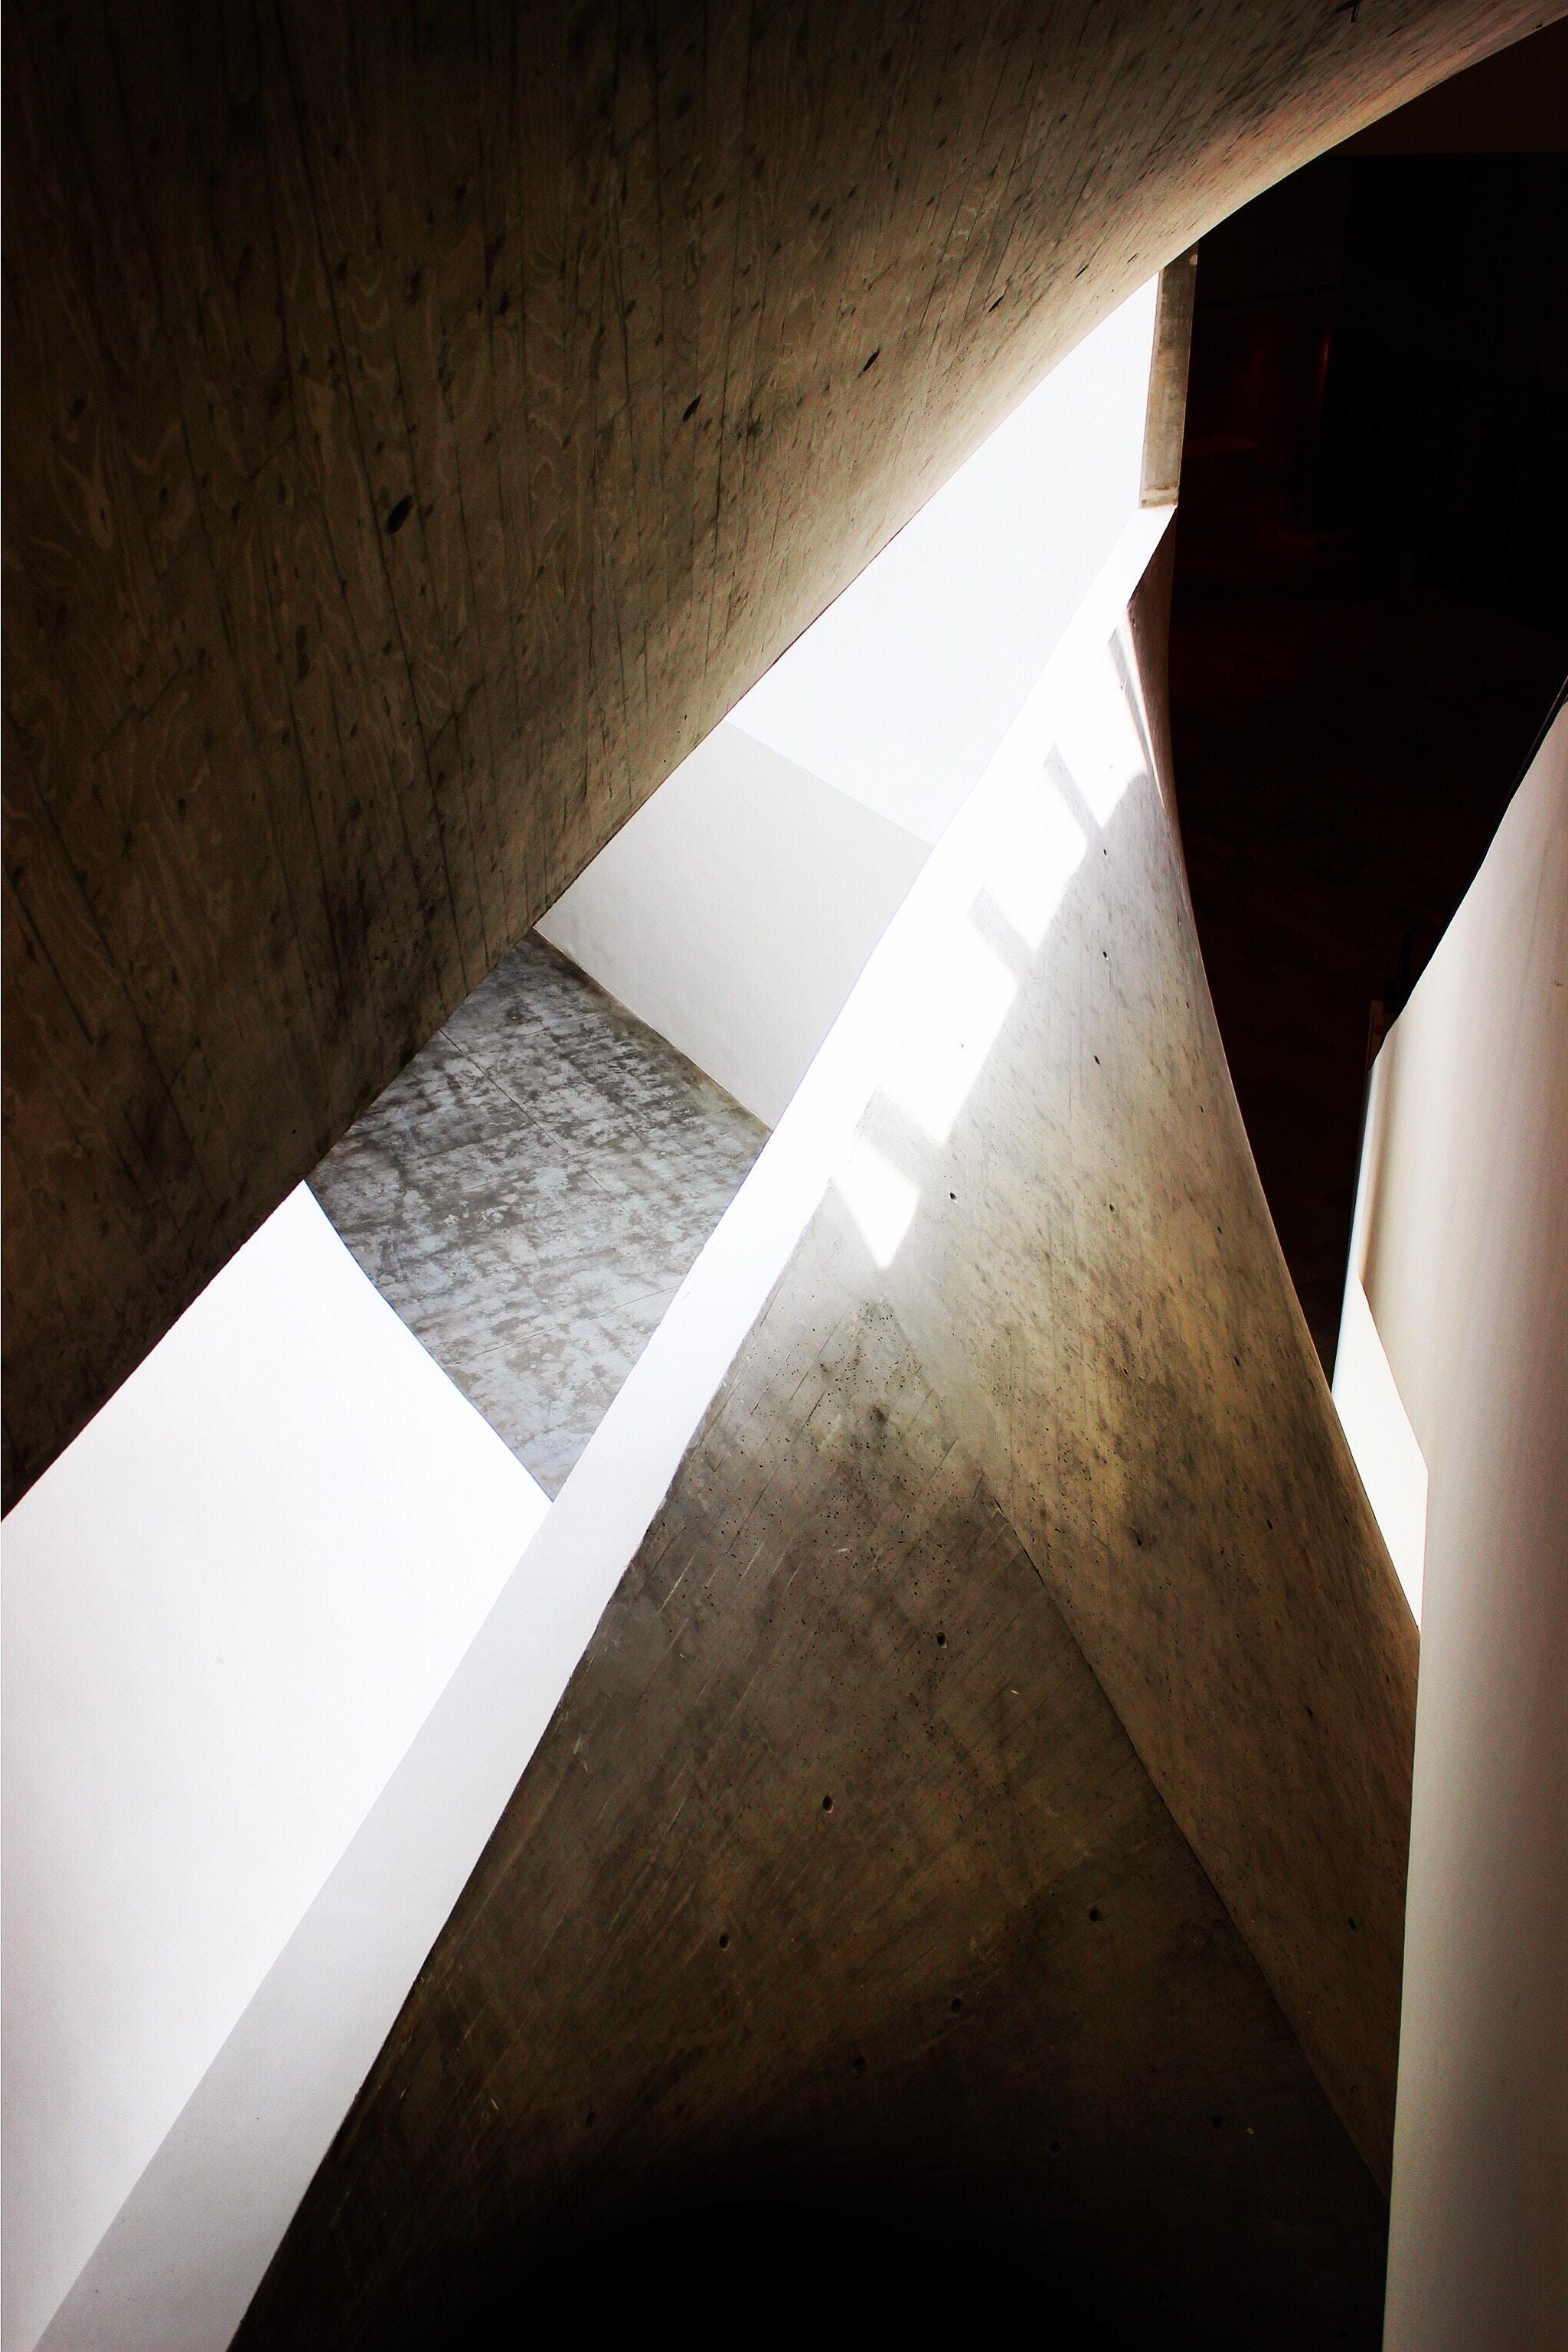 free-and-native-light-through-darkness.jpg